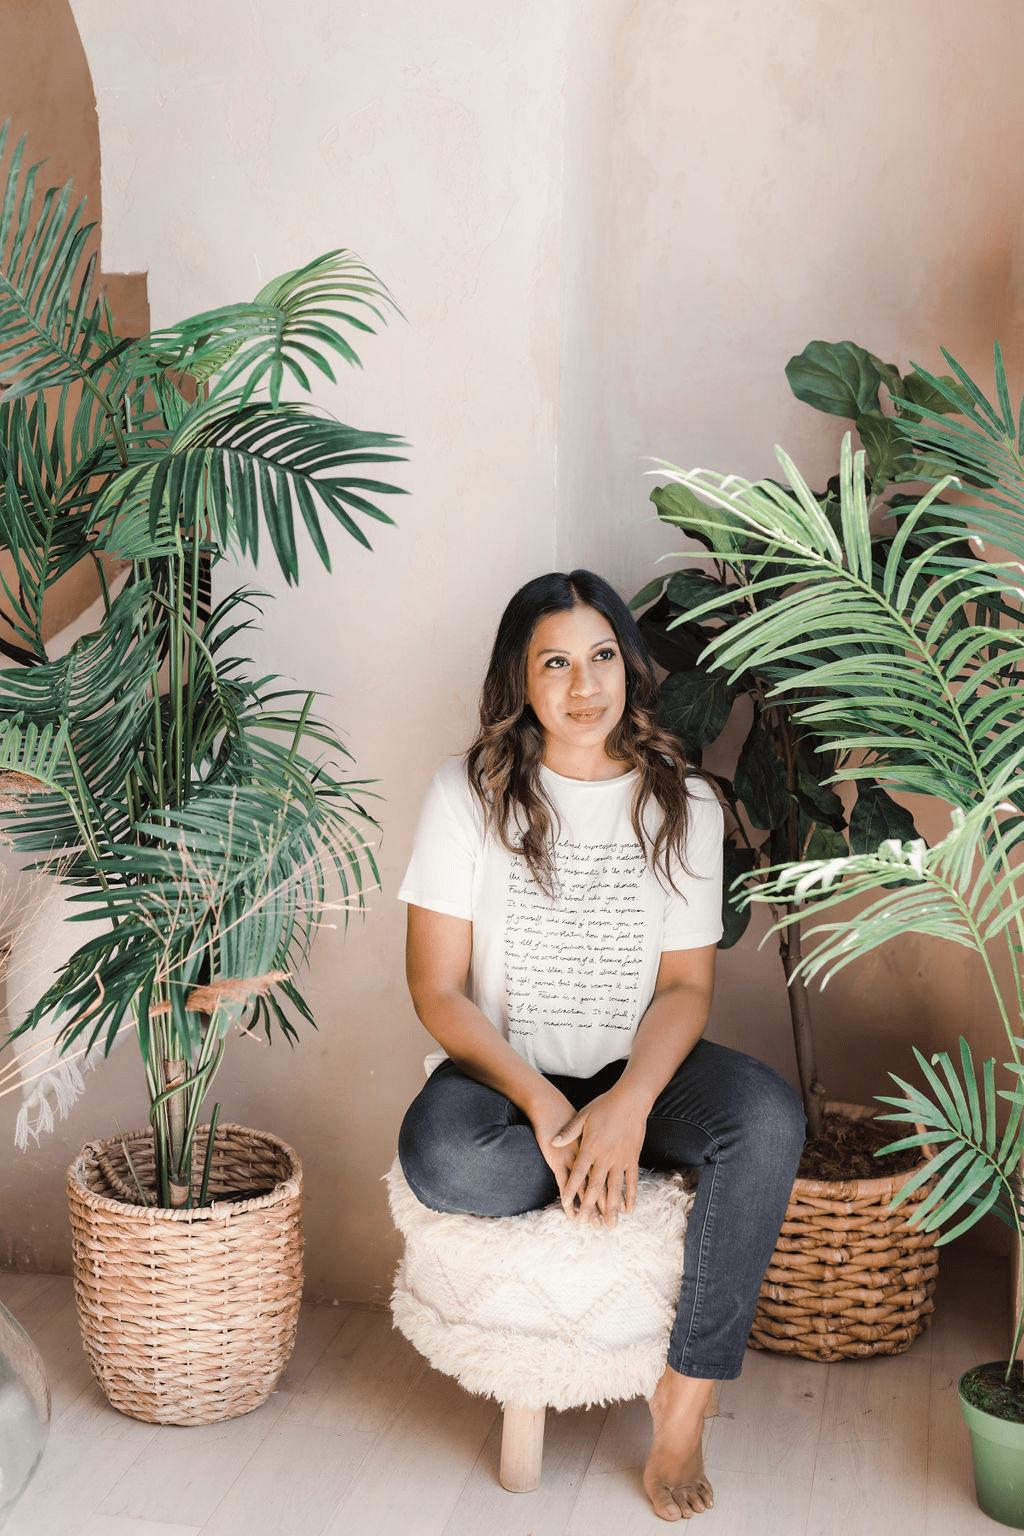 Mahara Mindfulness Co-founder, Genevive